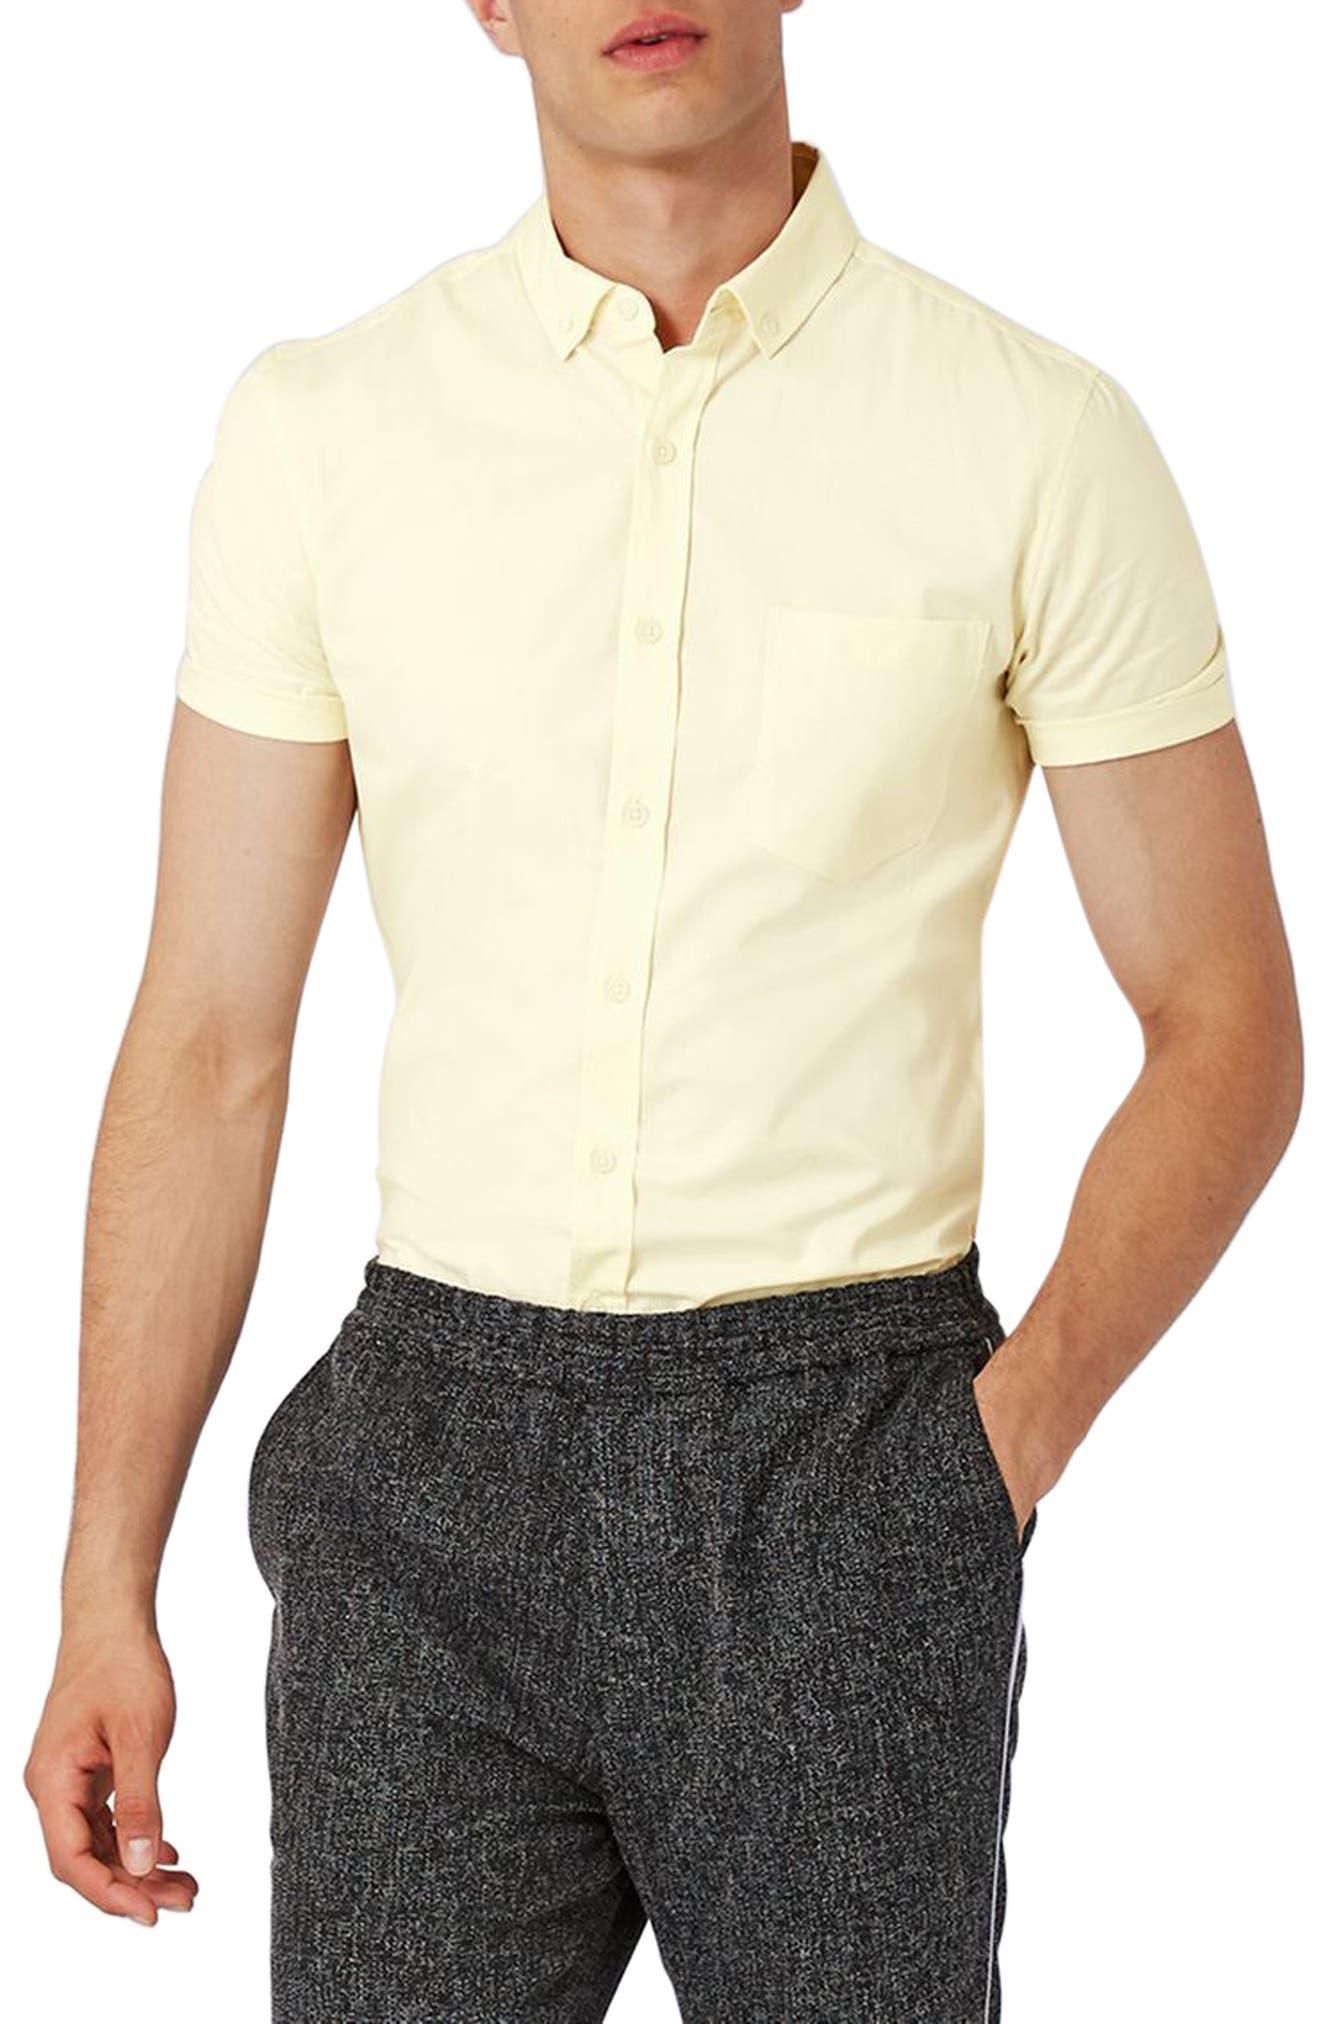 Topman Slim Fit Stretch Oxford Shirt